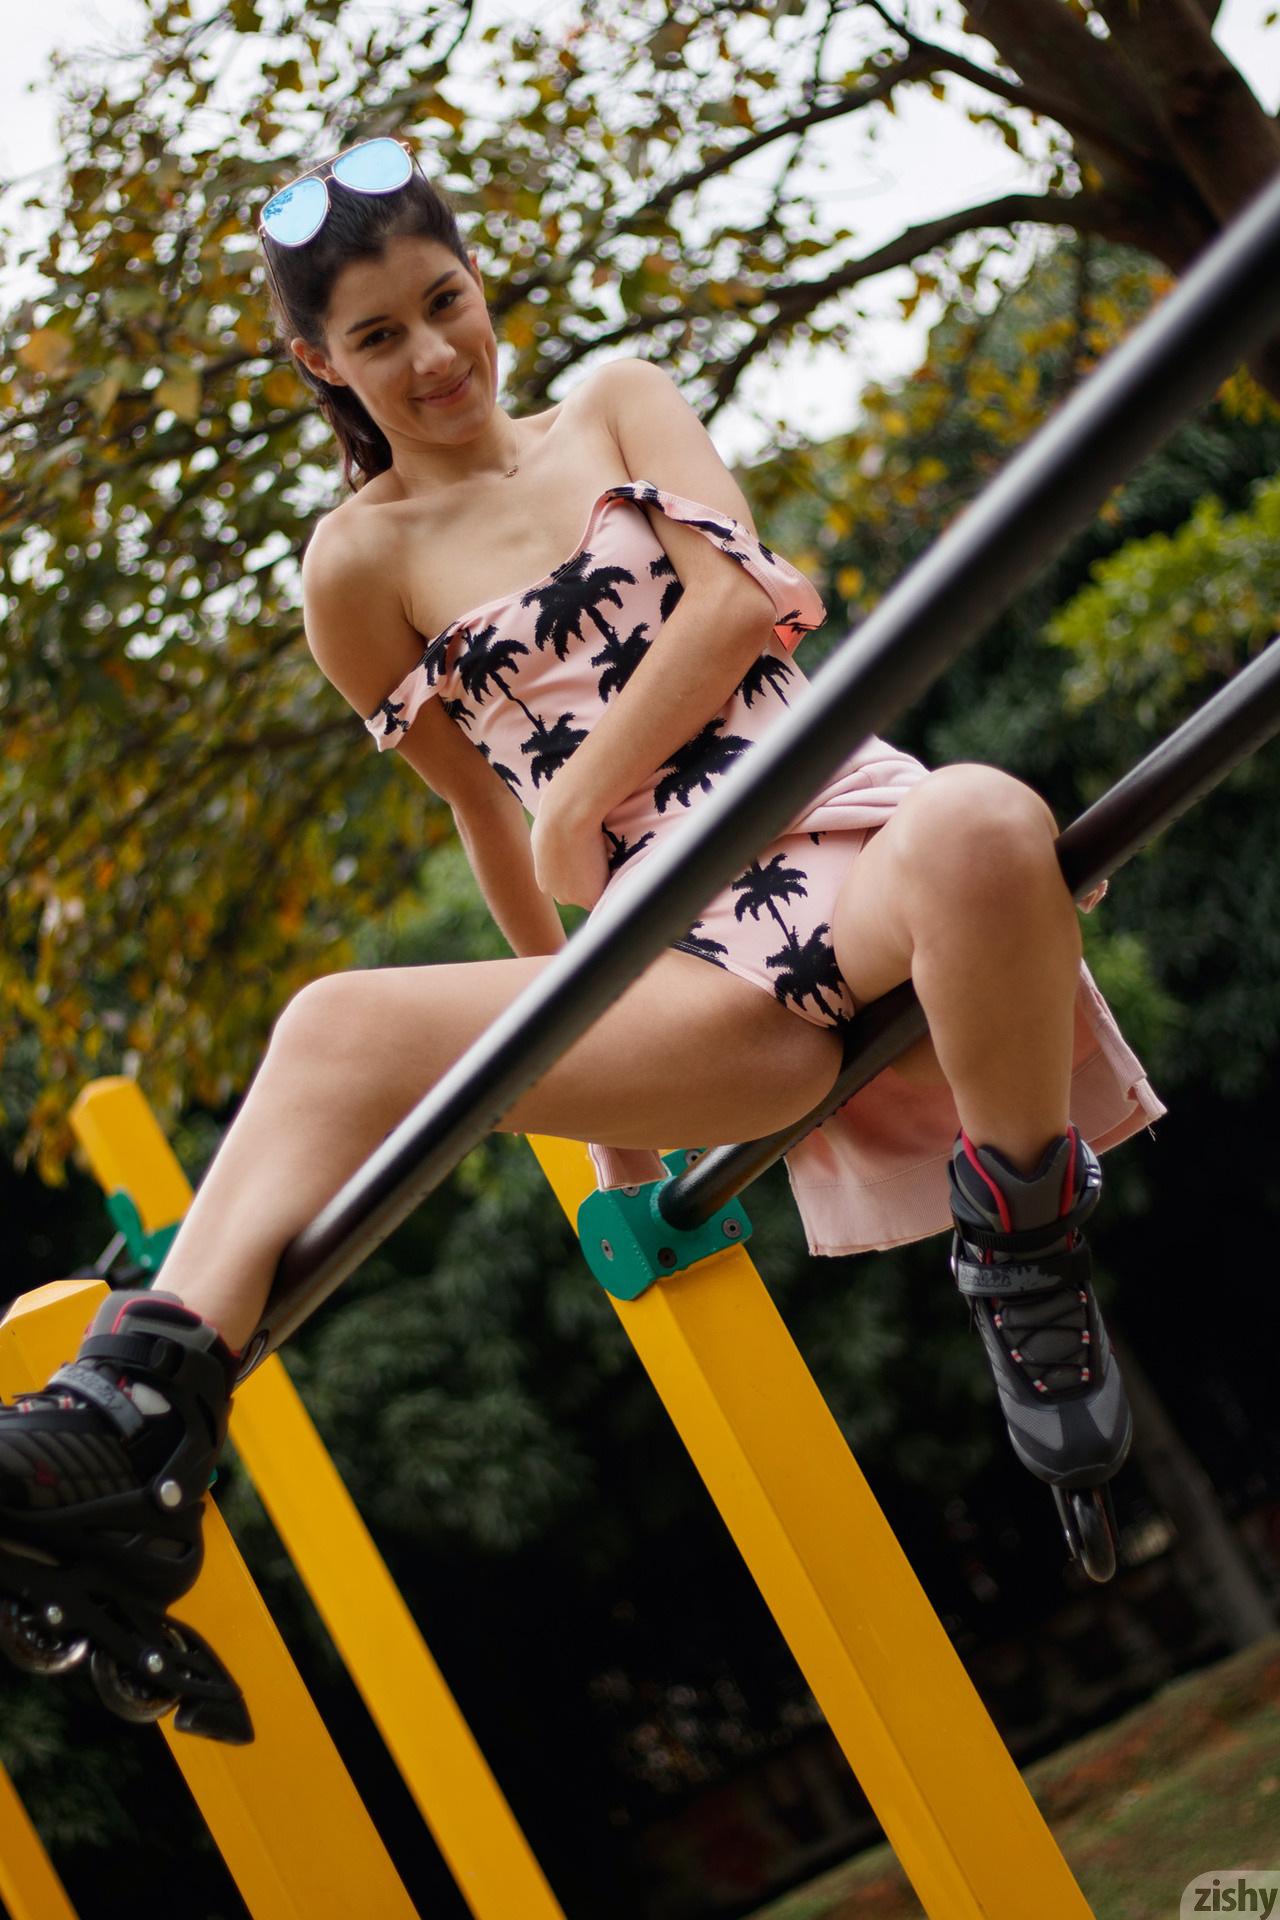 Kate Maze Skates Colombia Zishy (47)